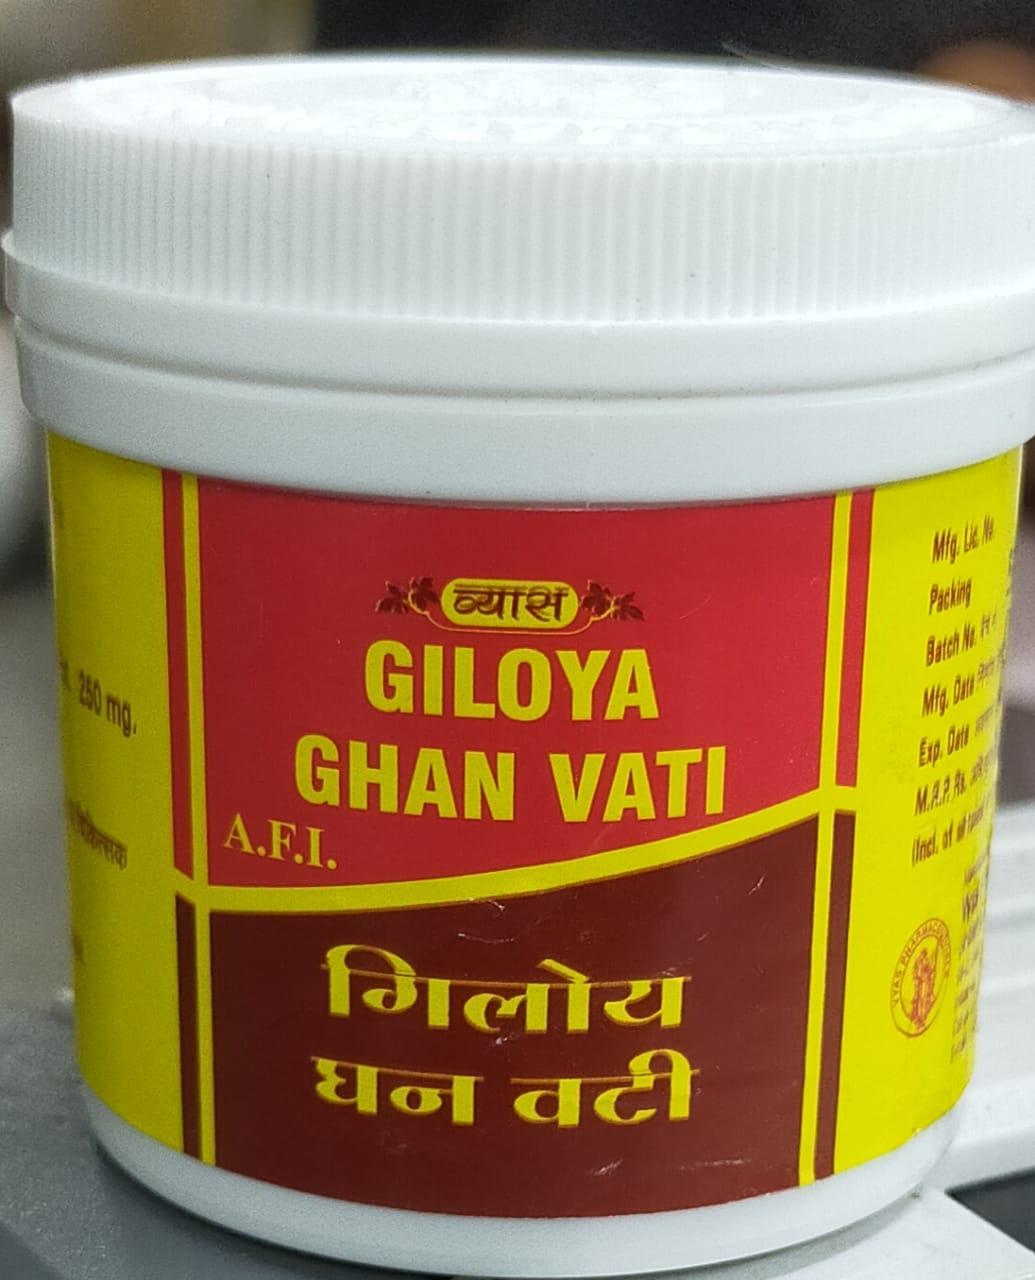 Vyas - Giloya Ghan Vati